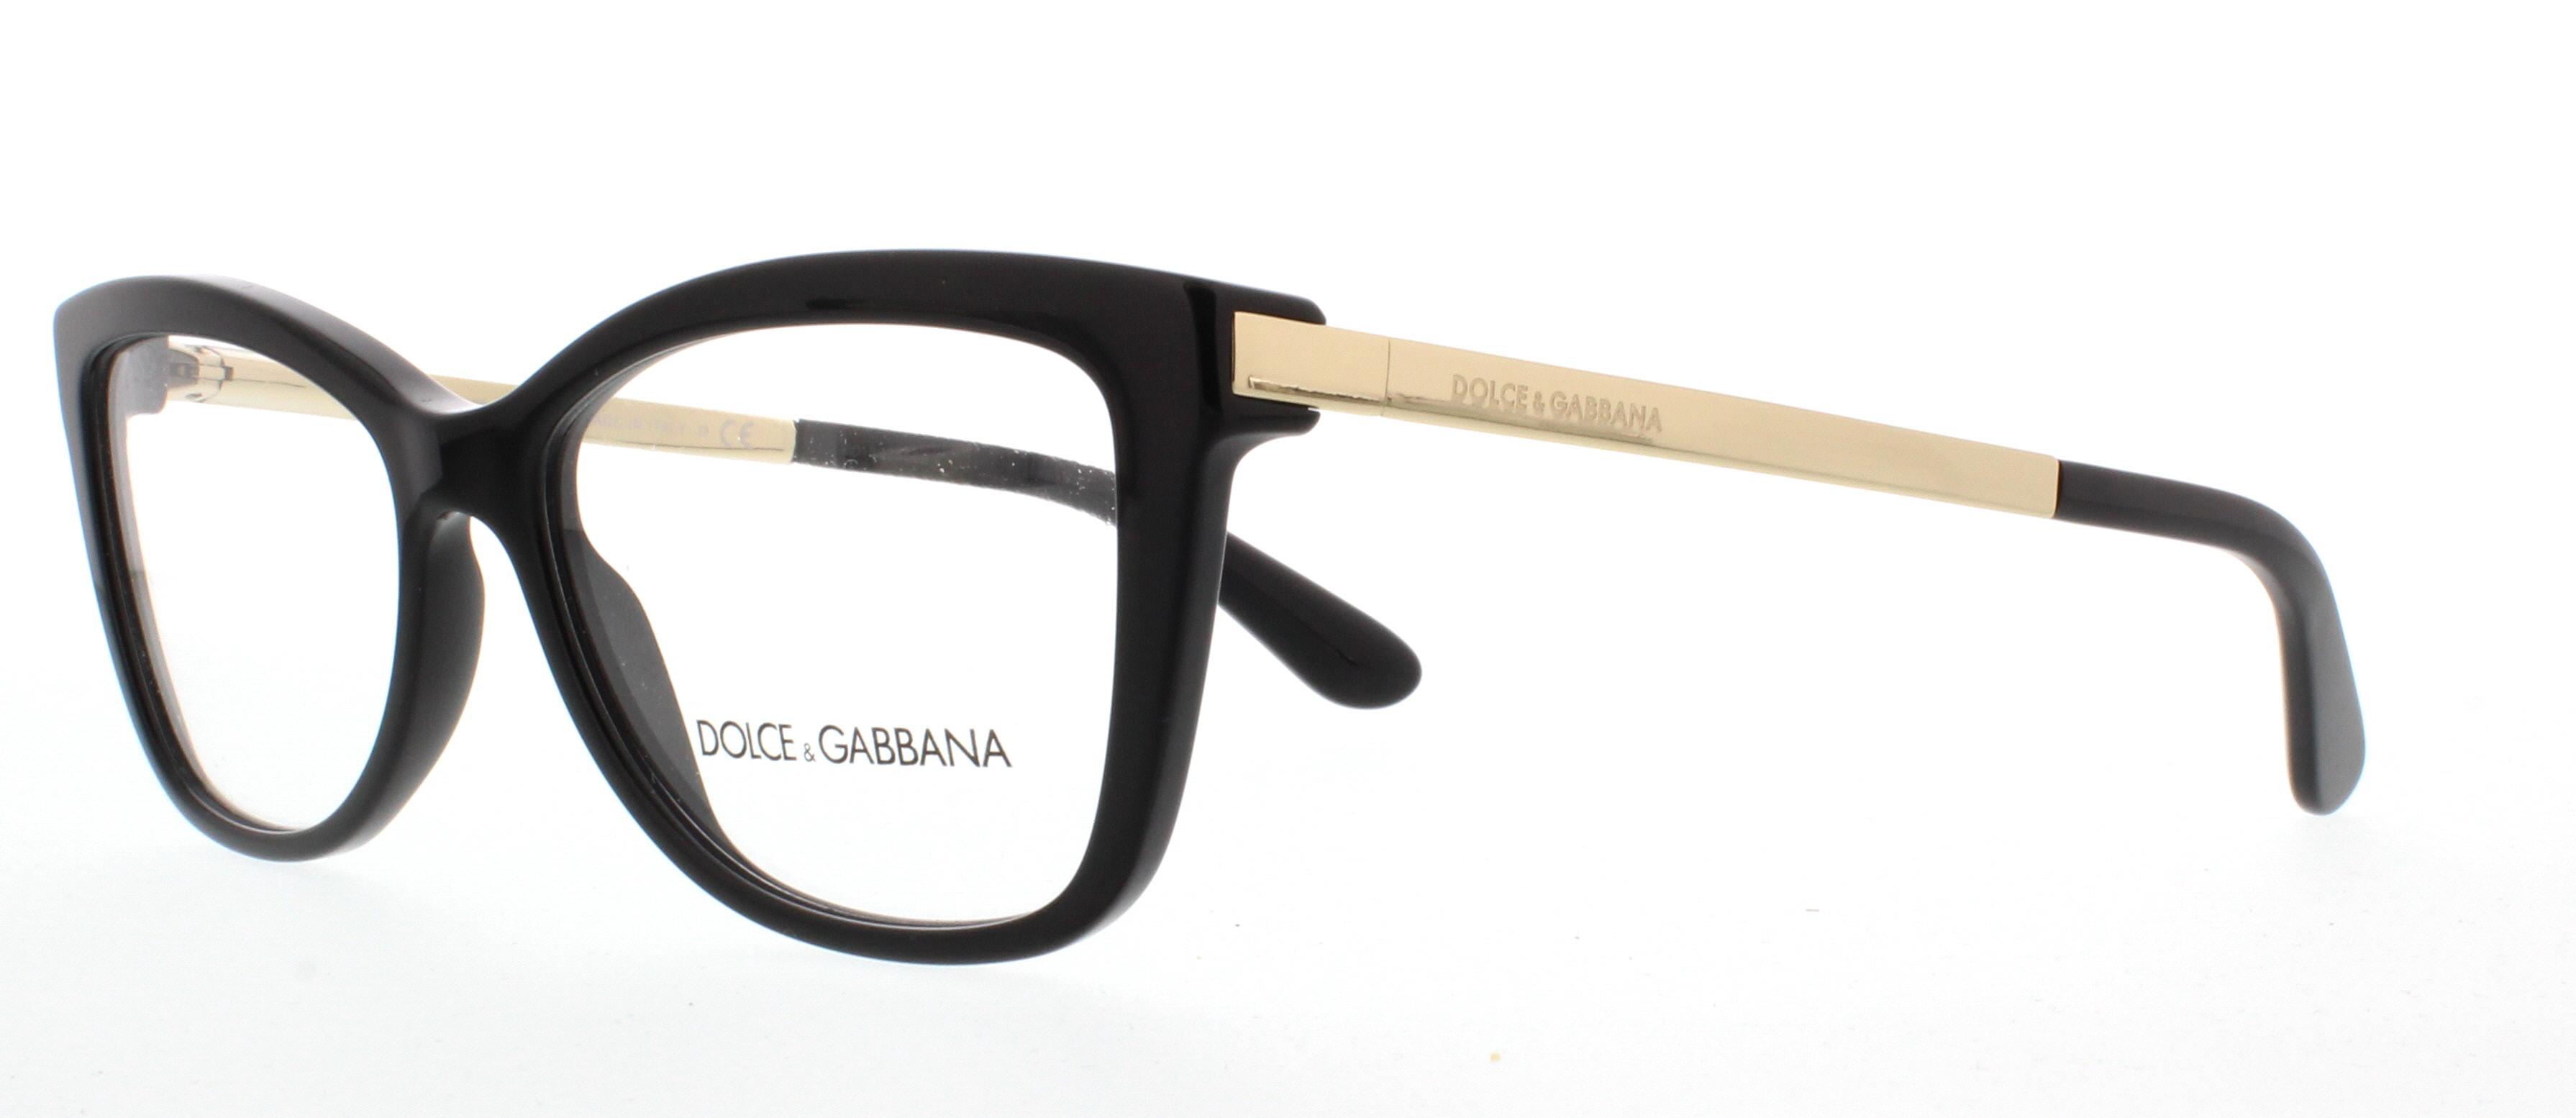 4c197822dd Dolce And Gabbana Eyeglasses Dg 3198 - Bitterroot Public Library